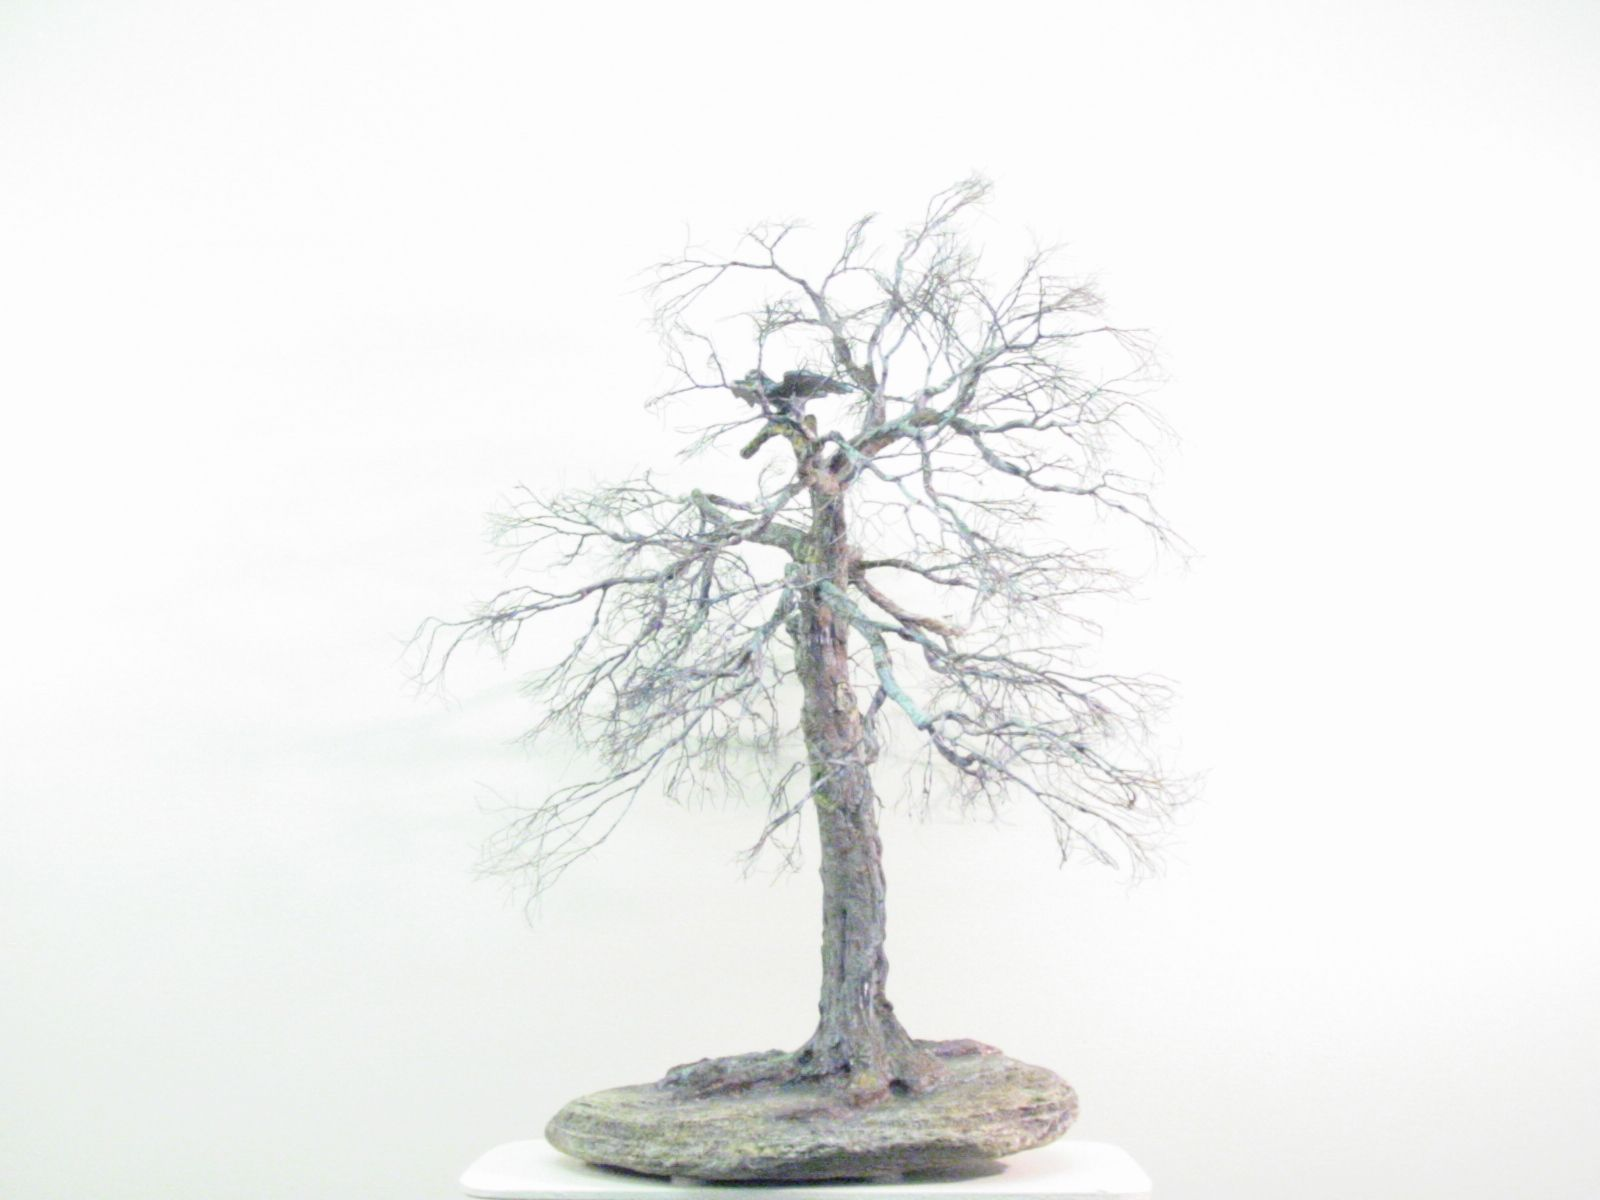 copper wire tree - bonsai style - natural rock